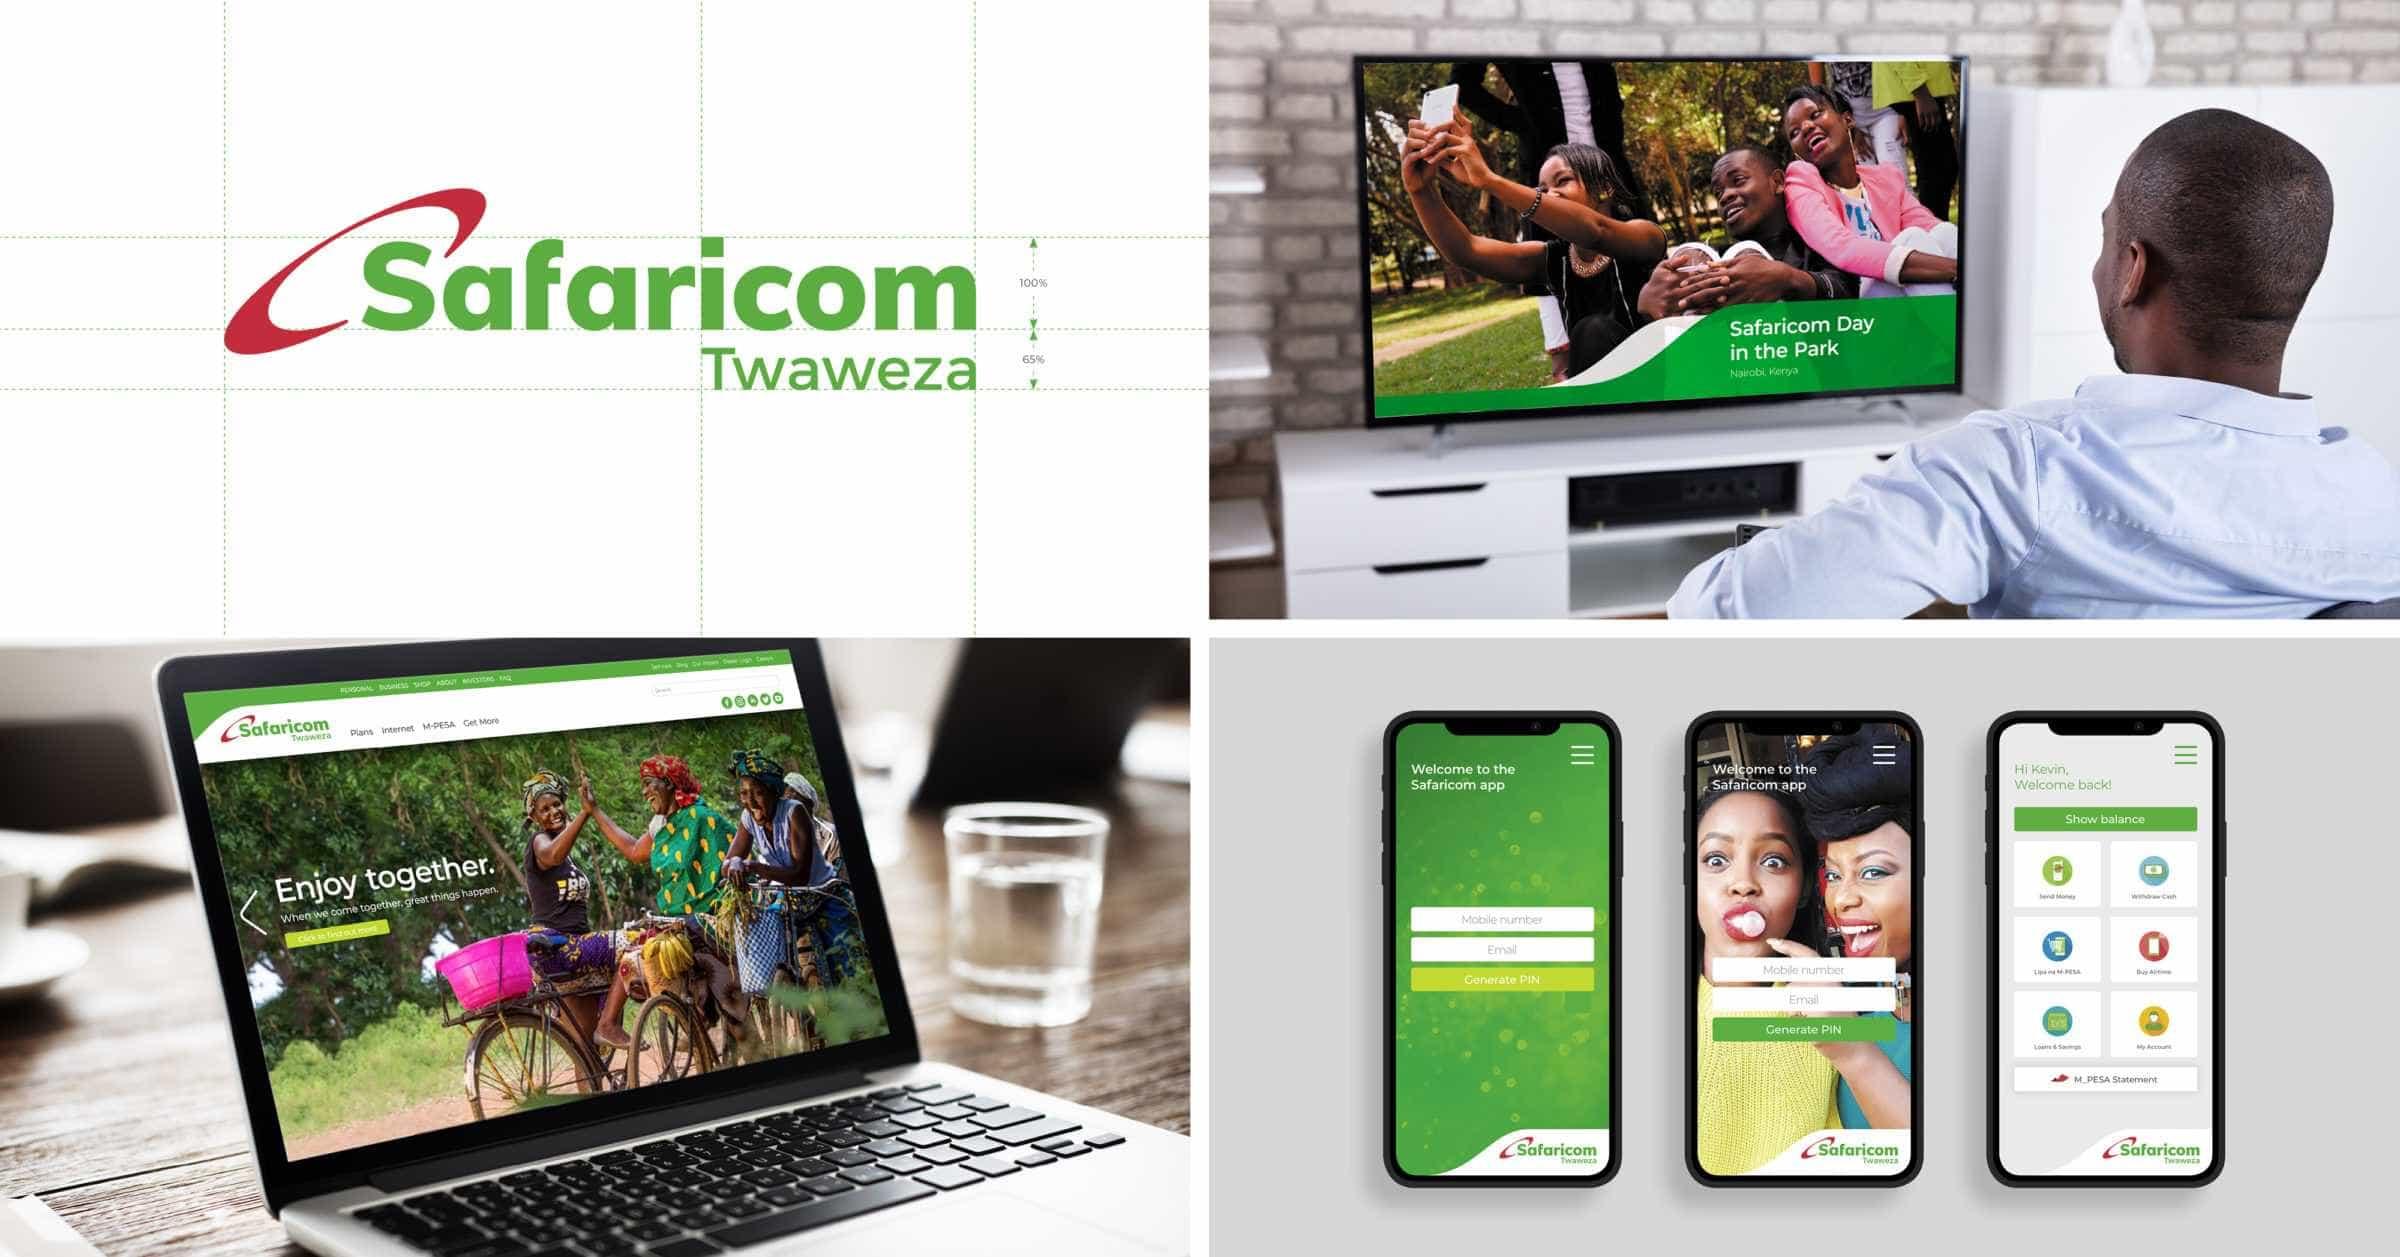 Safaricom_01.1